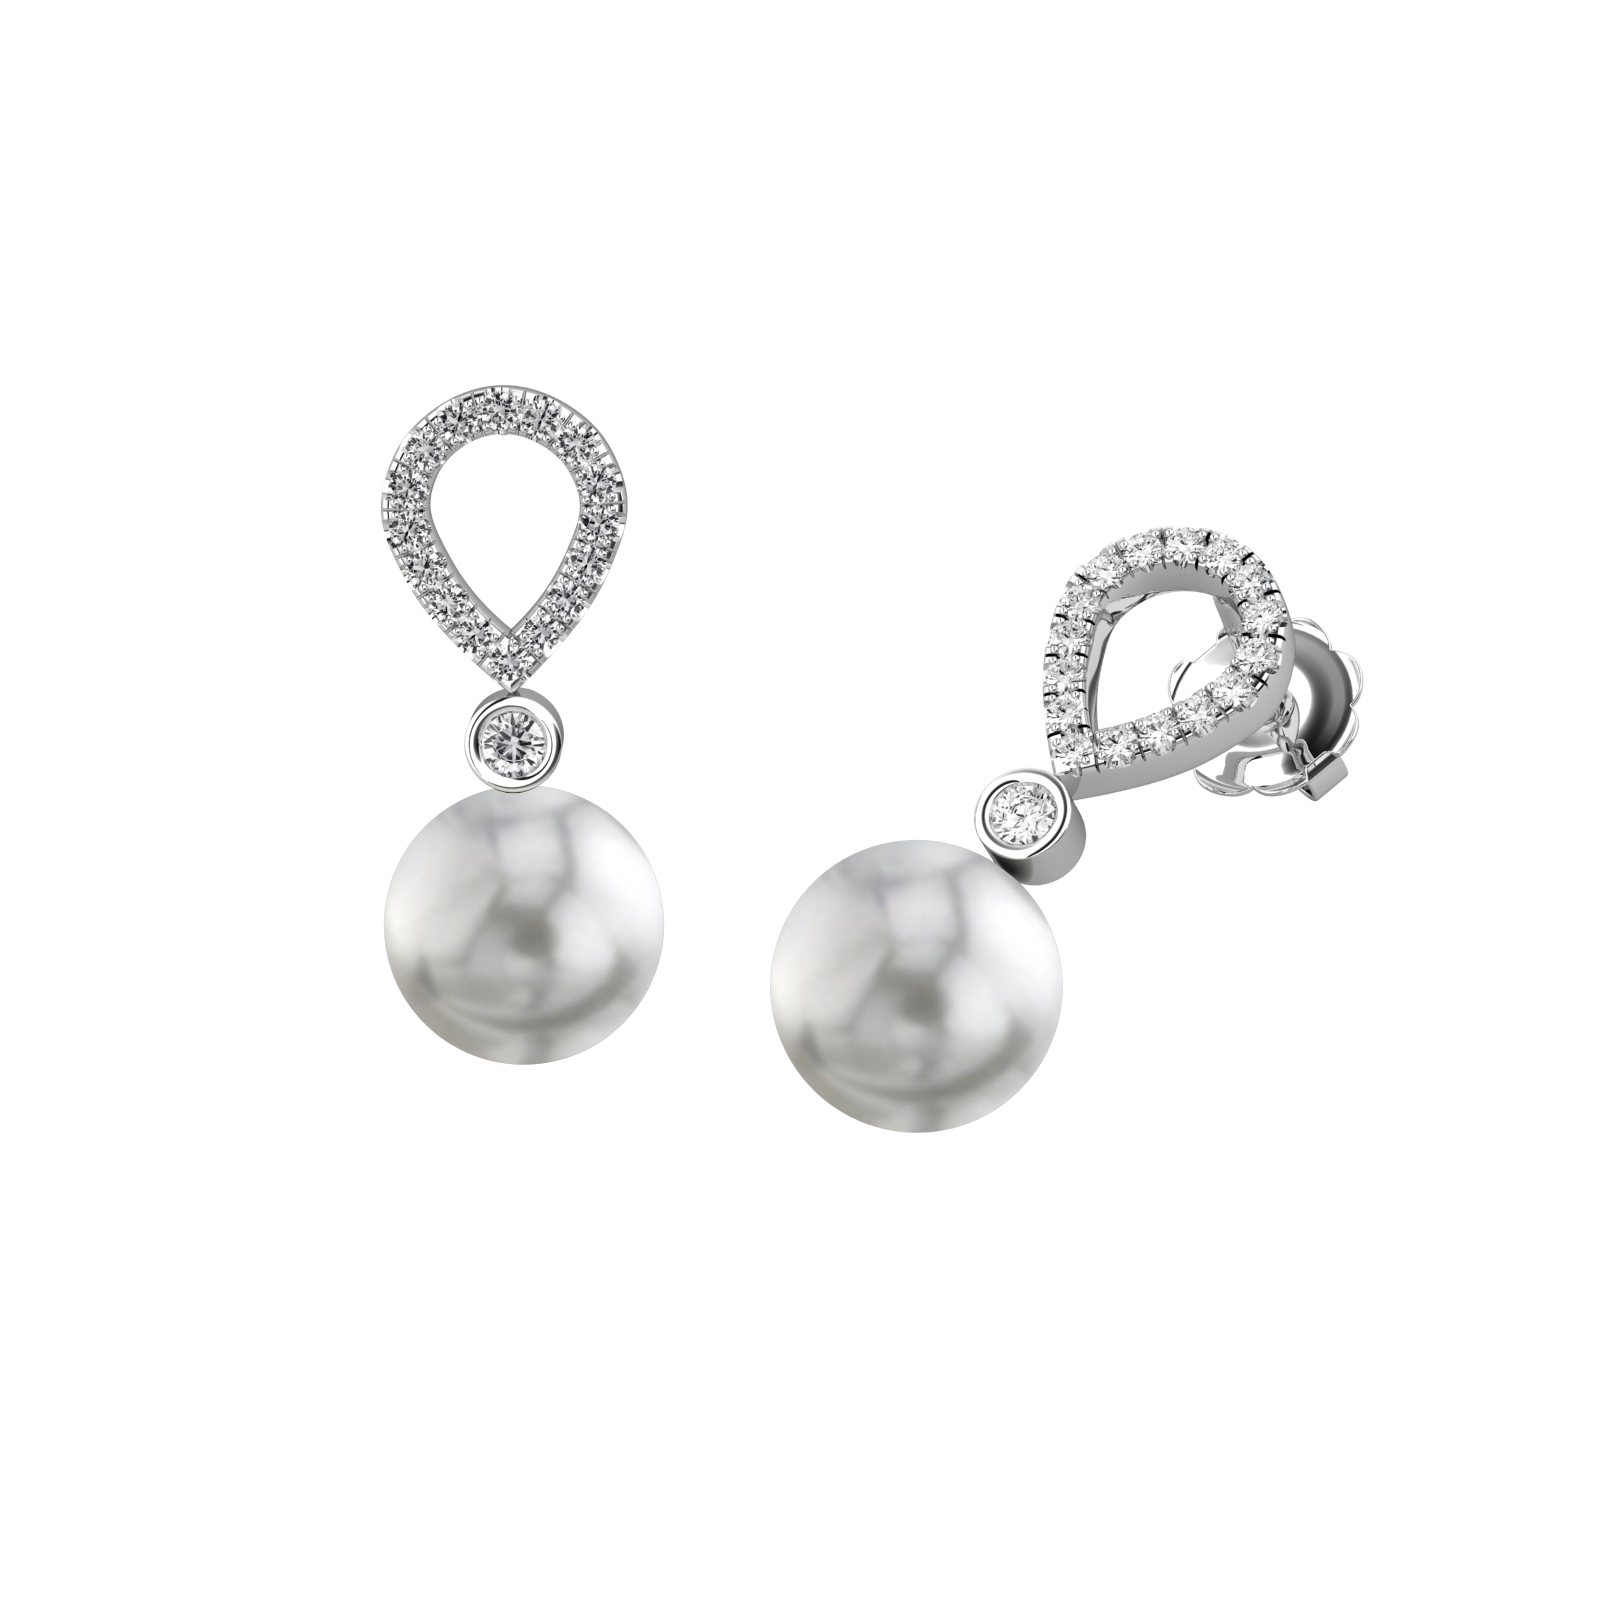 Cercei Eleganti din Aur Alb 18kt cu Perle Argintiu Inchis si Diamante Rotunde Briliant-img1